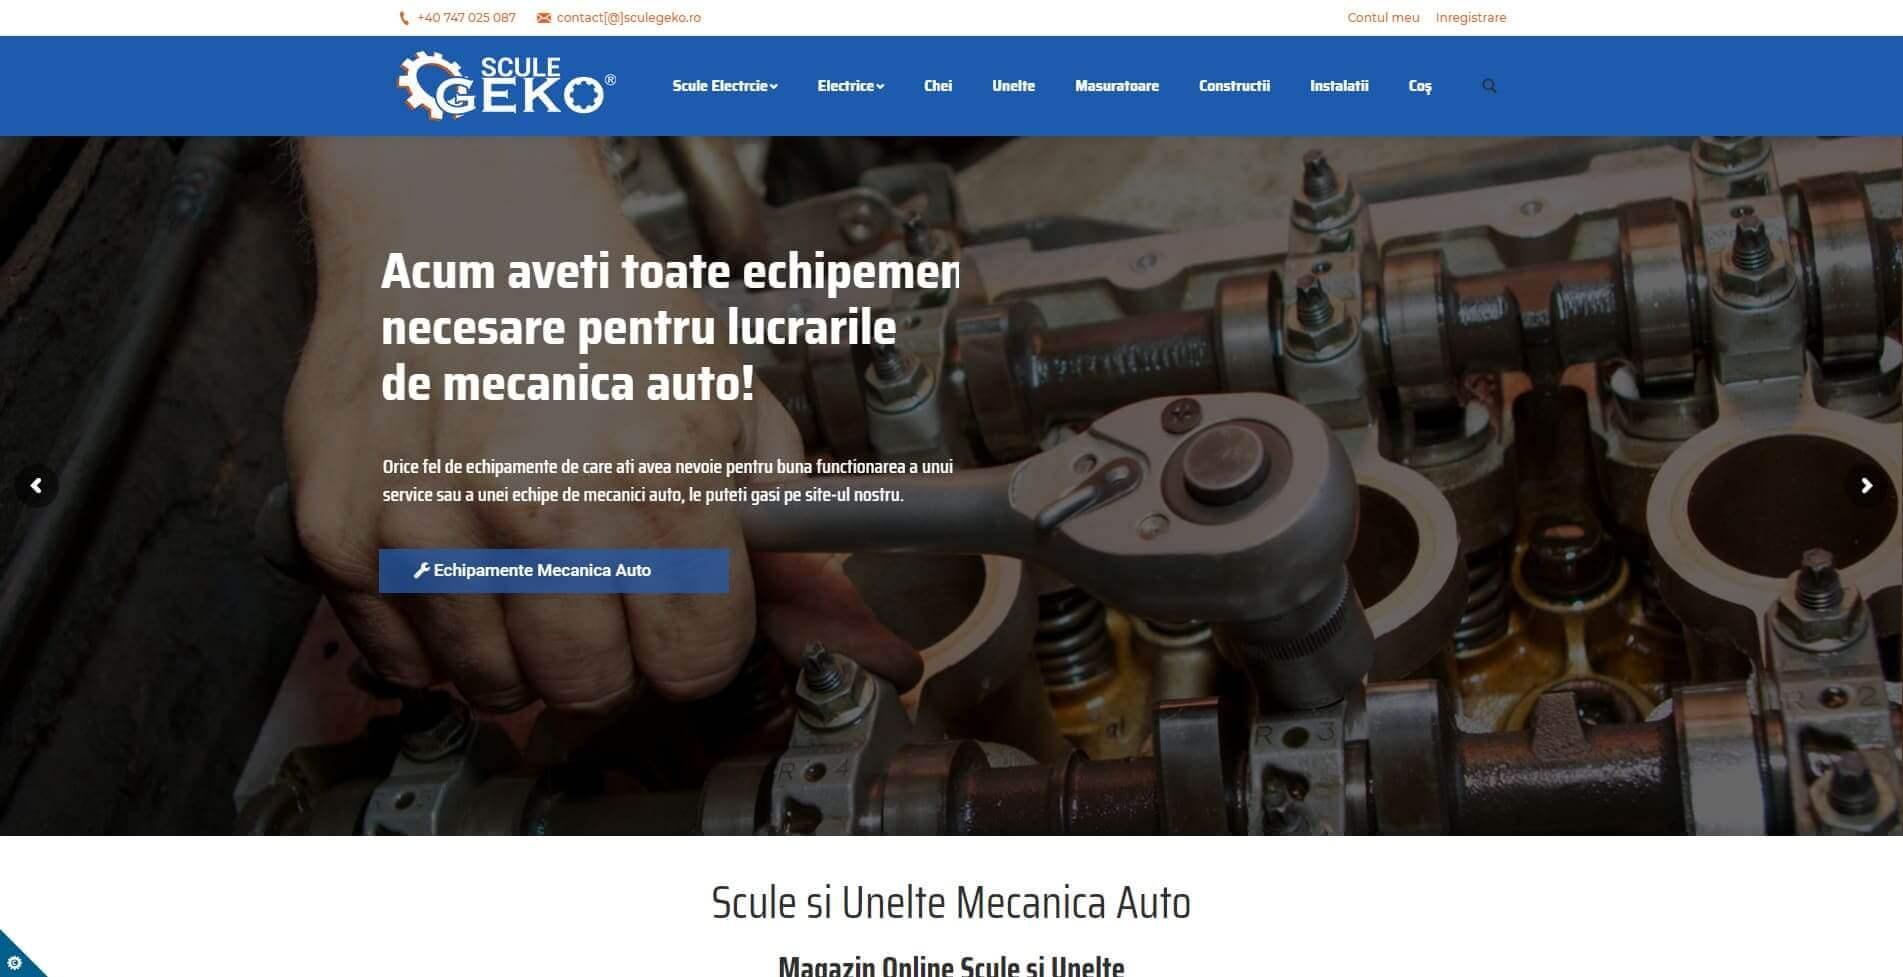 Web Design Timisoara Scule Geko